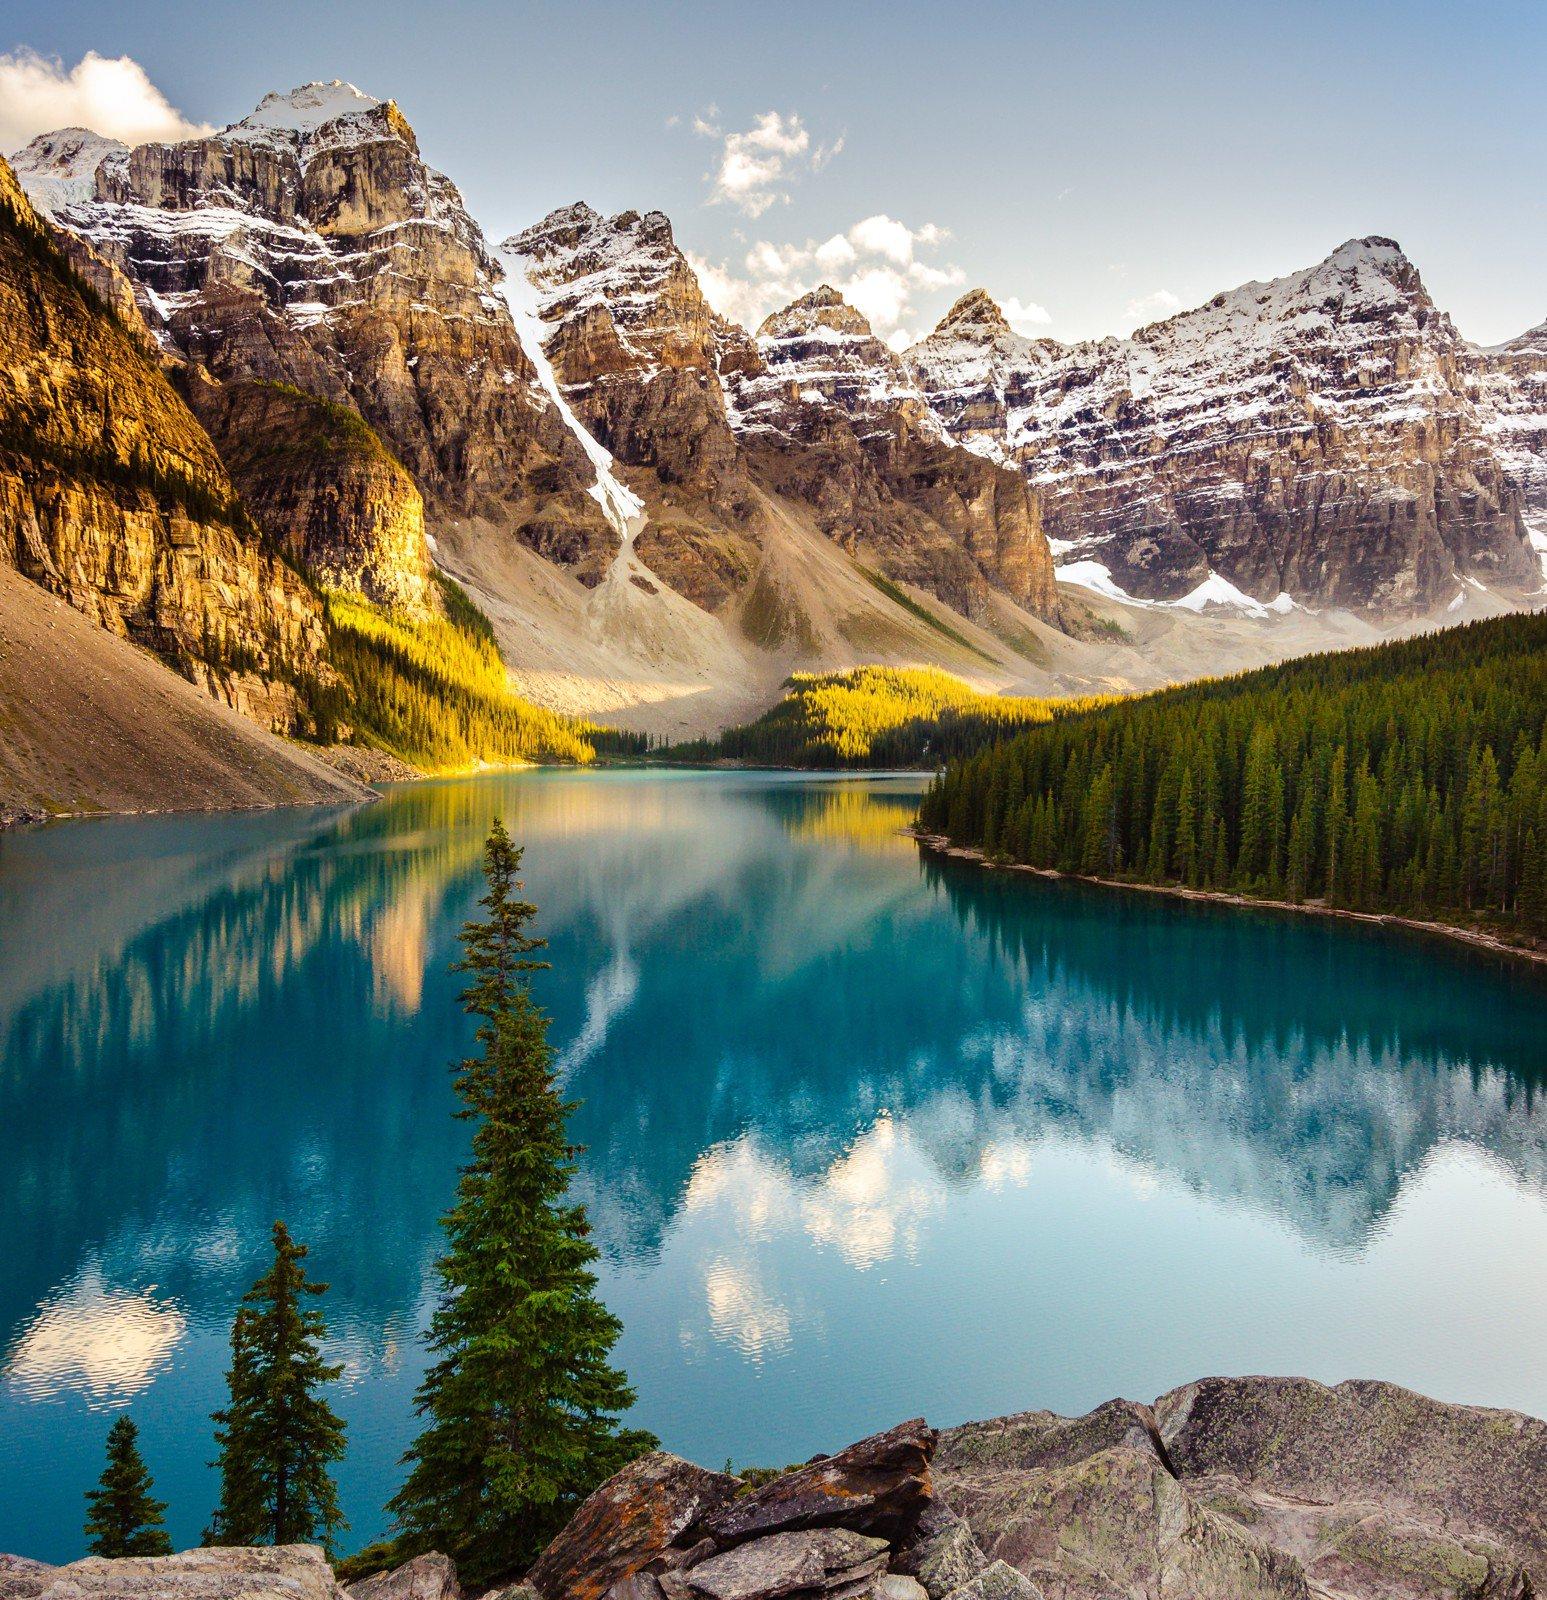 Infoavond West-Canada Zomer aanbod - online infosessie